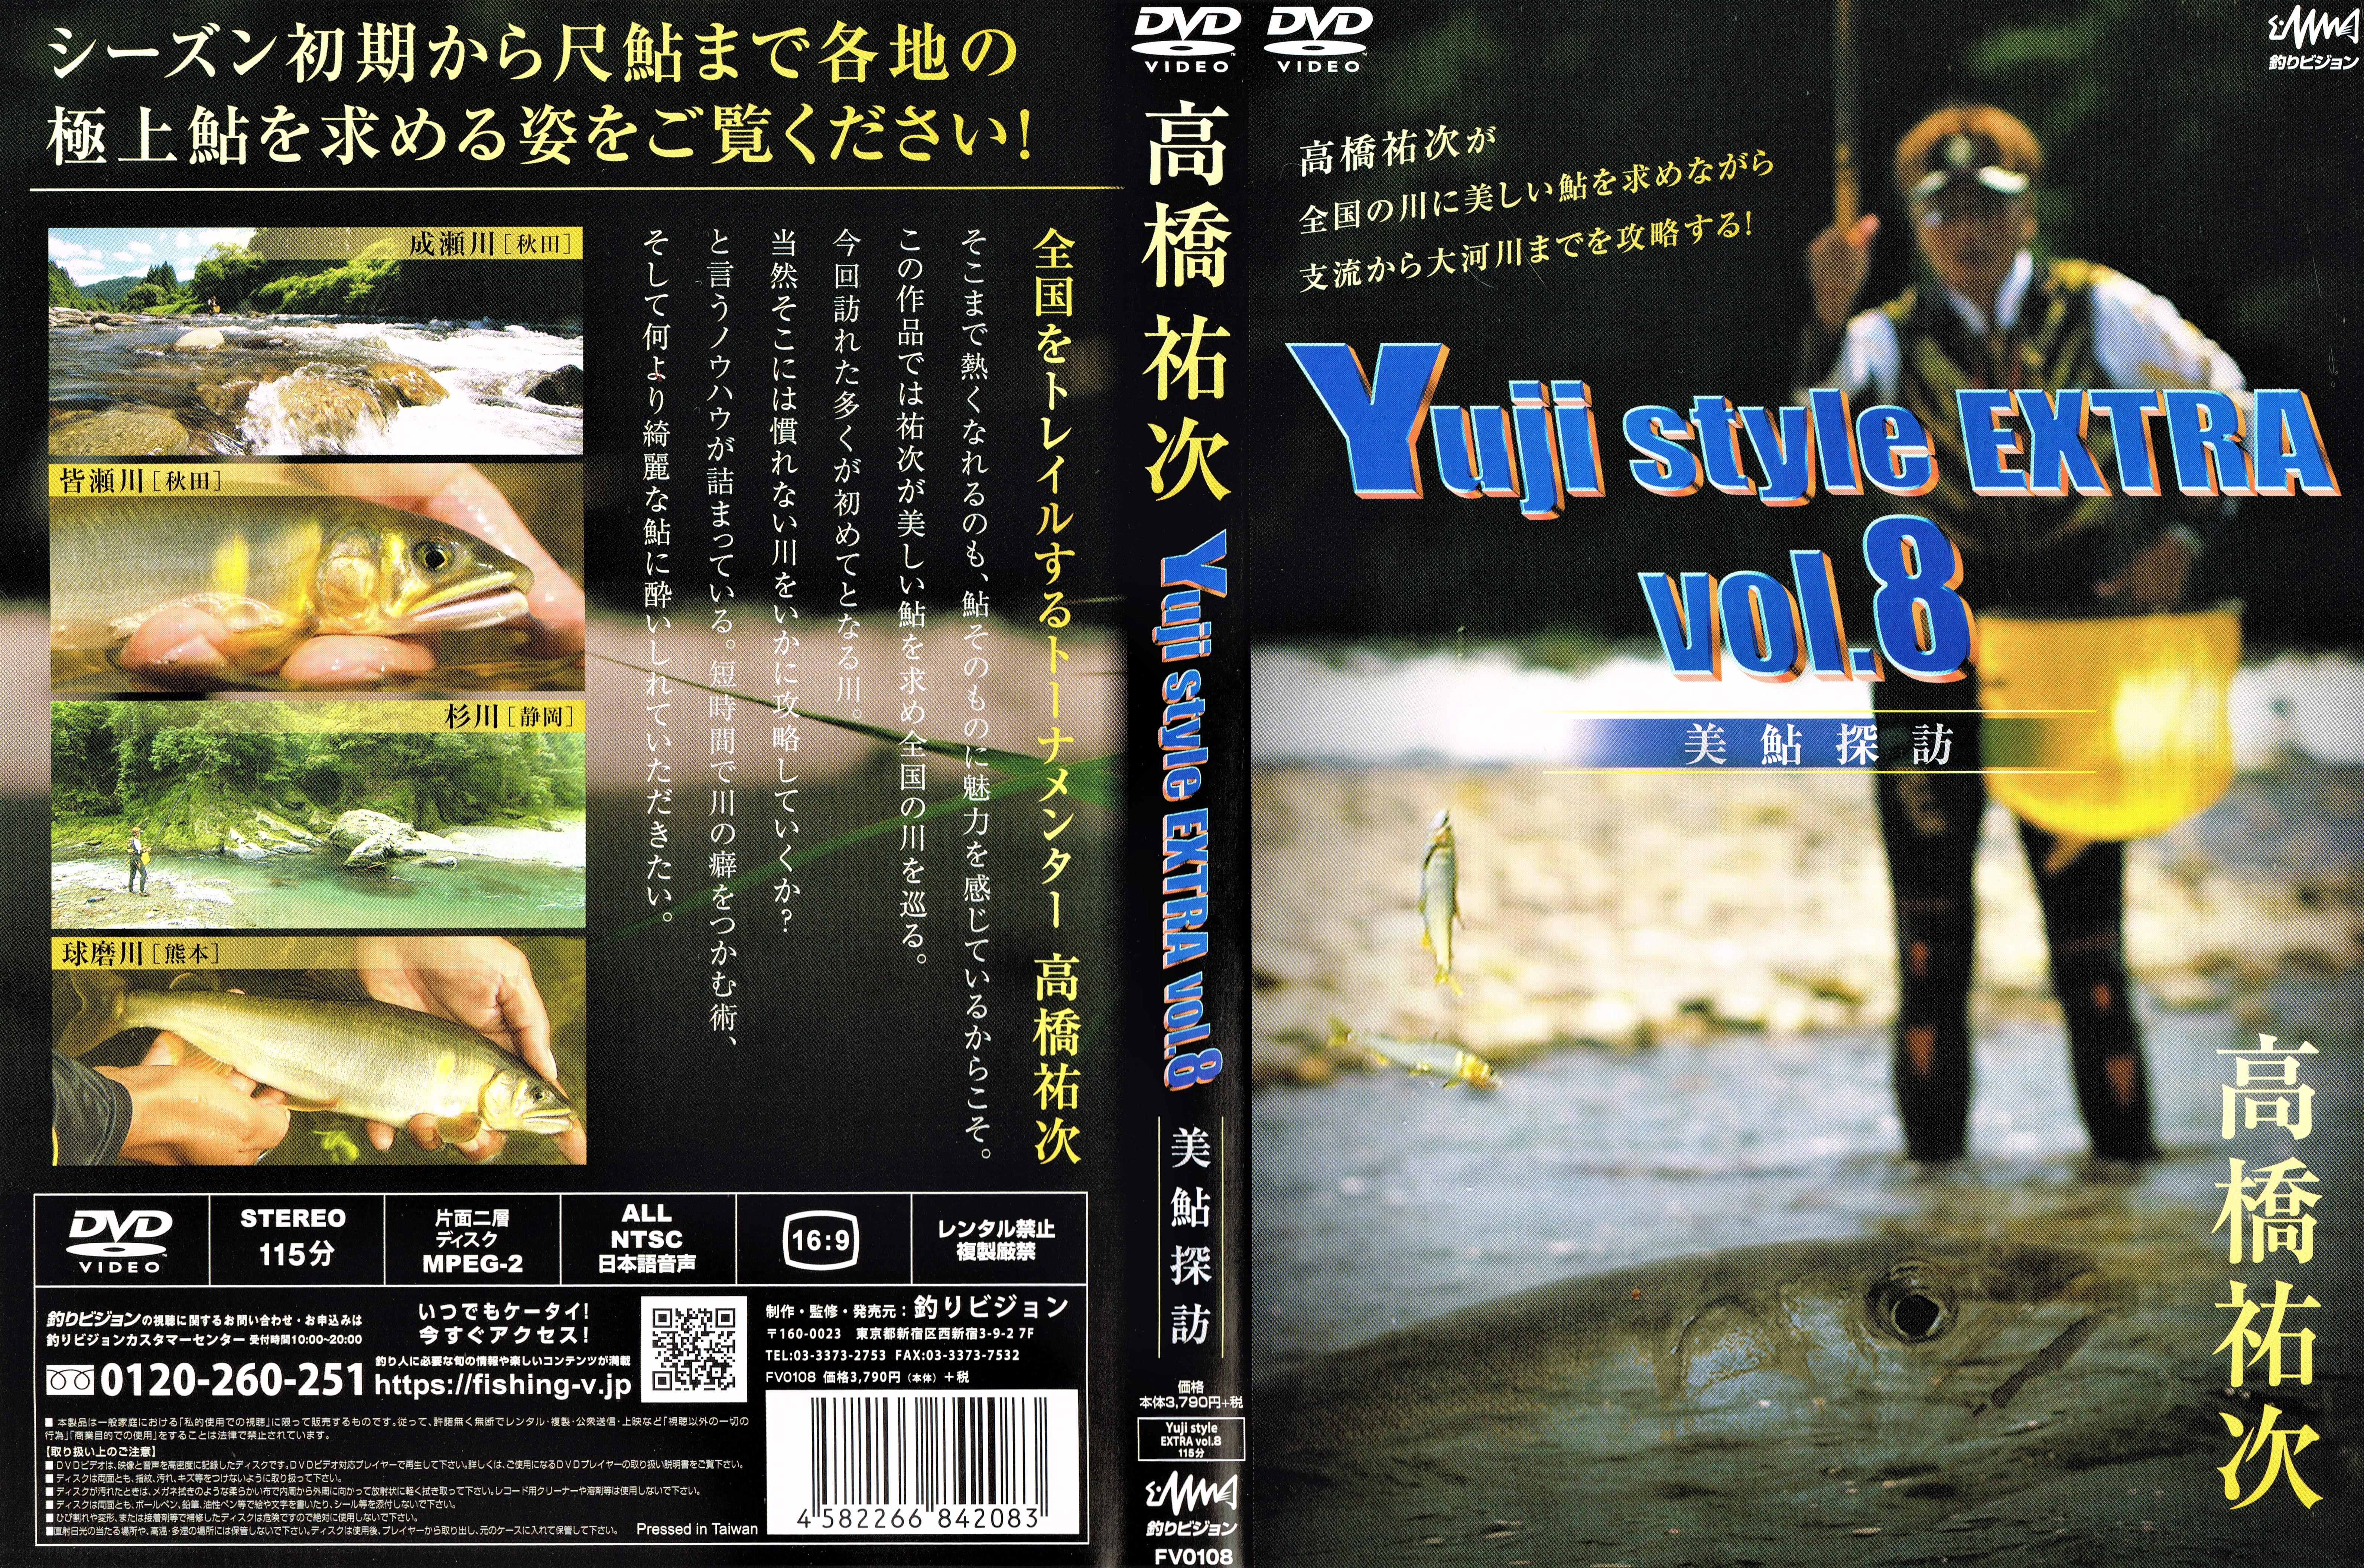 Yuji Style EXTRA vol.8